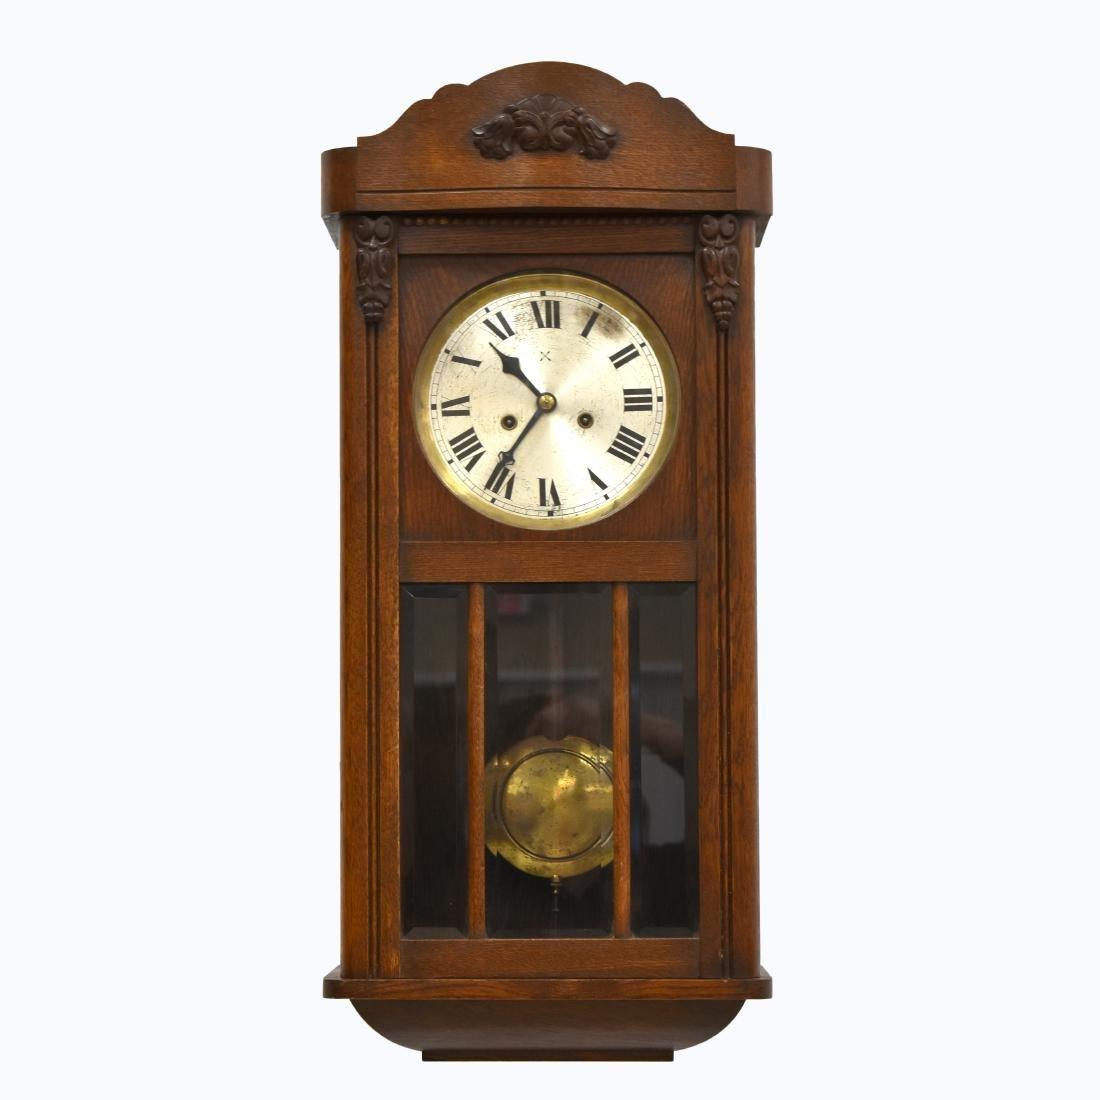 1920 REGULATOR-STYLE CLOCK